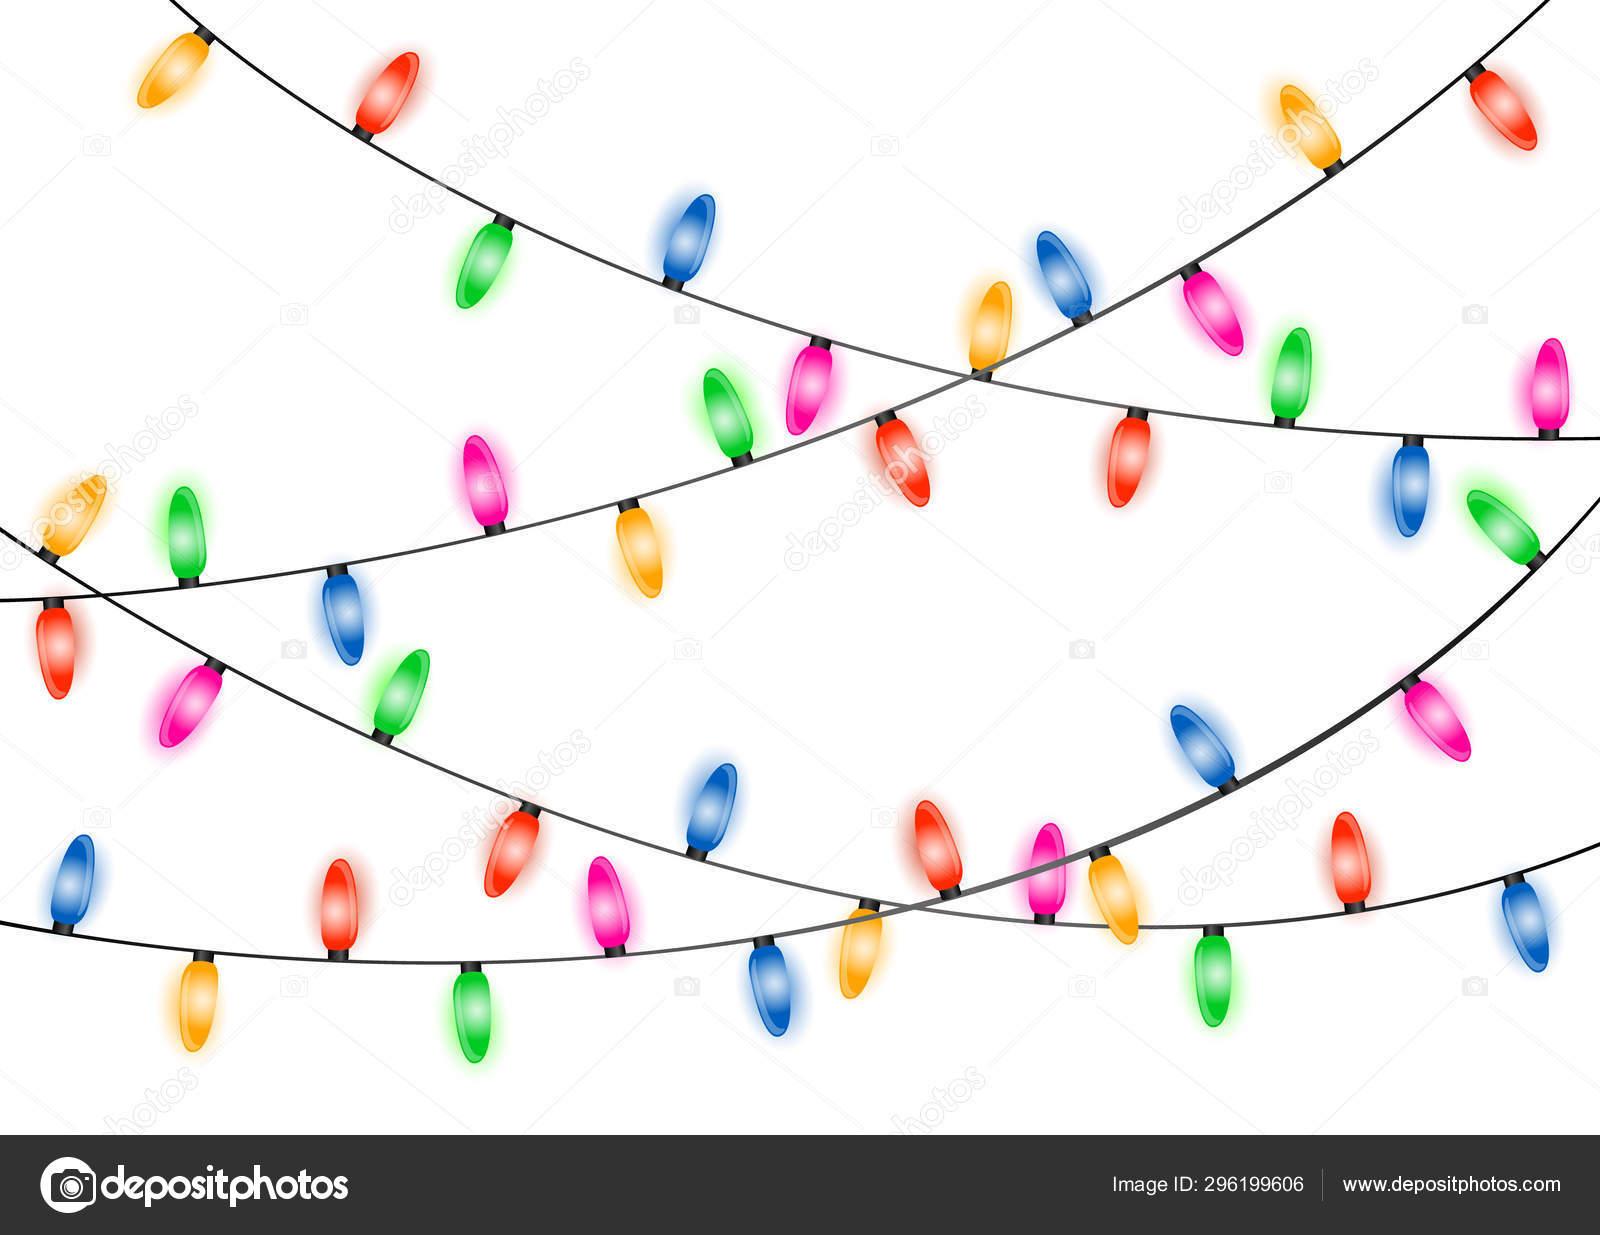 christmas lights vector illustration stock vector c kingvector 296199606 christmas lights vector illustration stock vector c kingvector 296199606